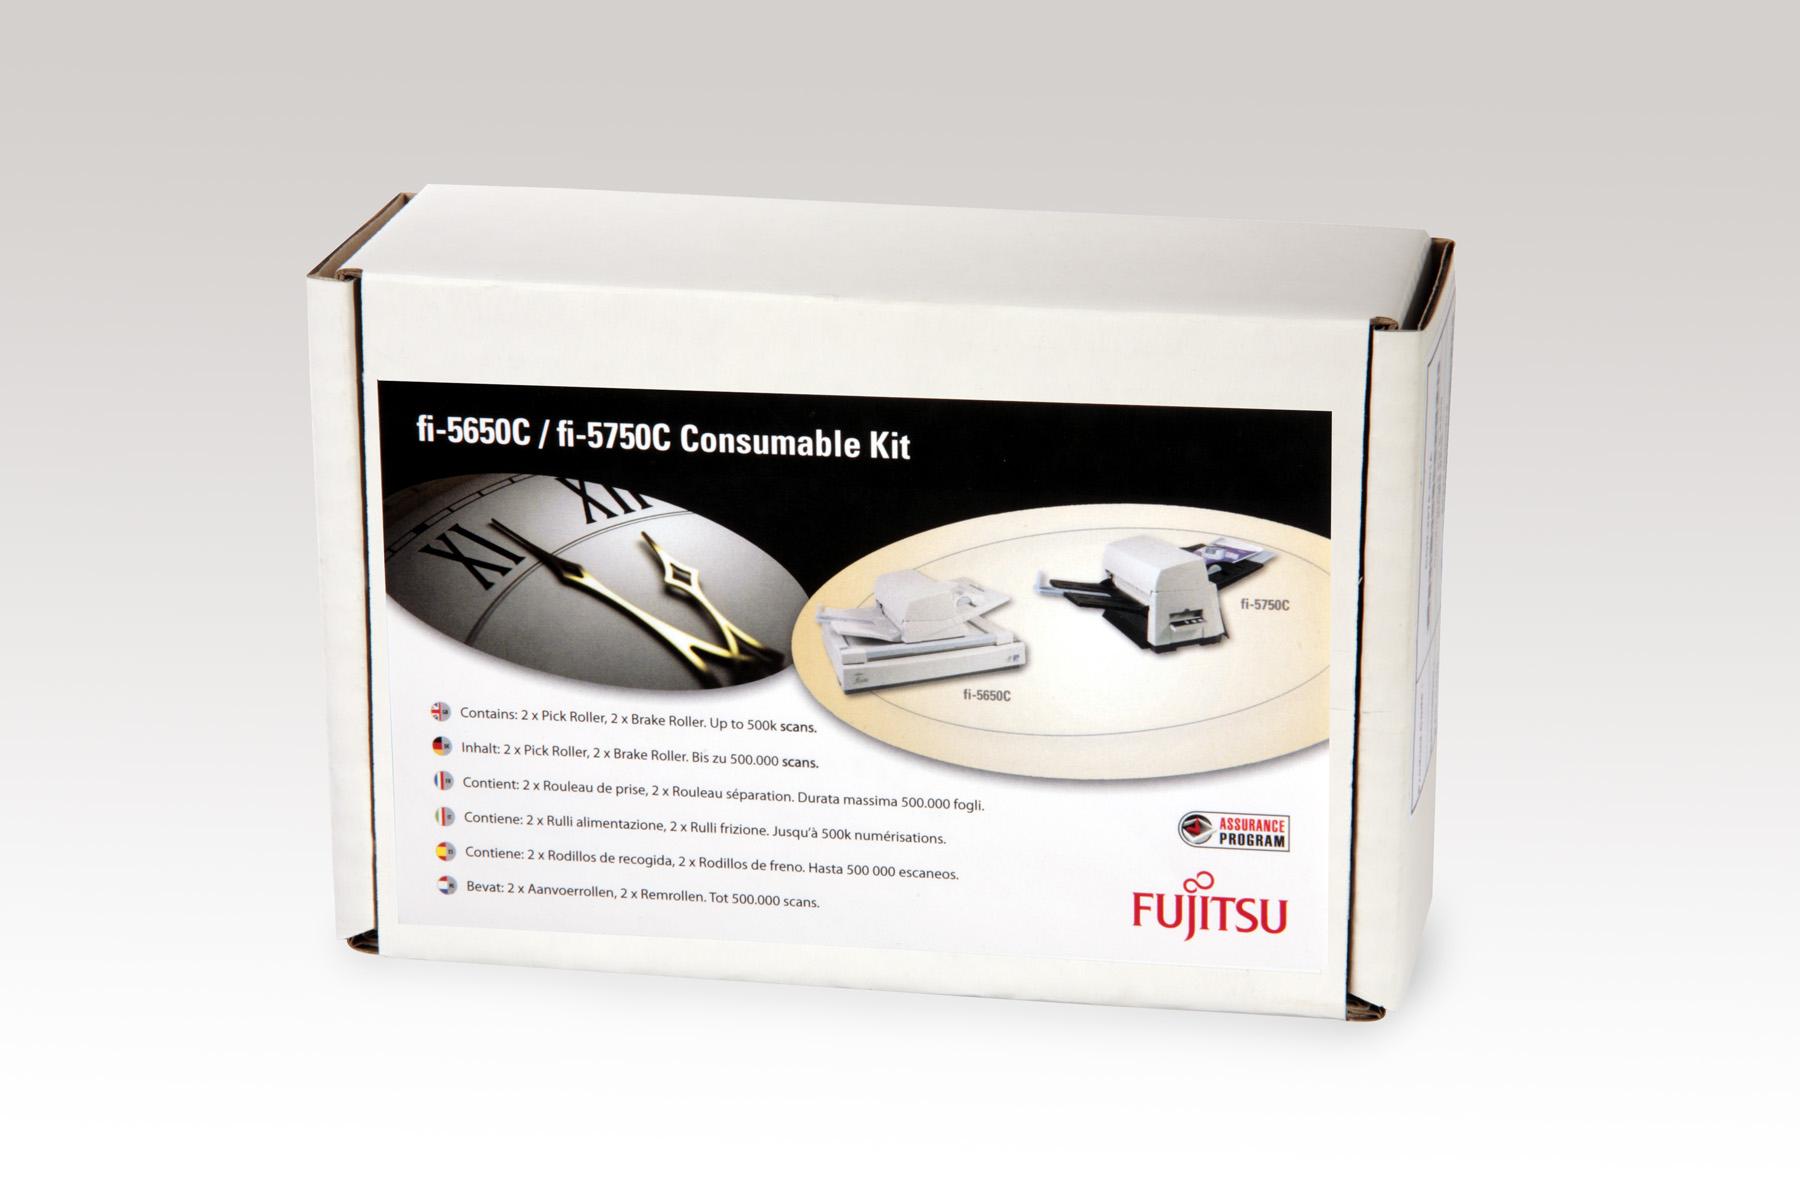 Fujitsu Cons kit FI-5650/5750/Pad Assy/Pick Roll